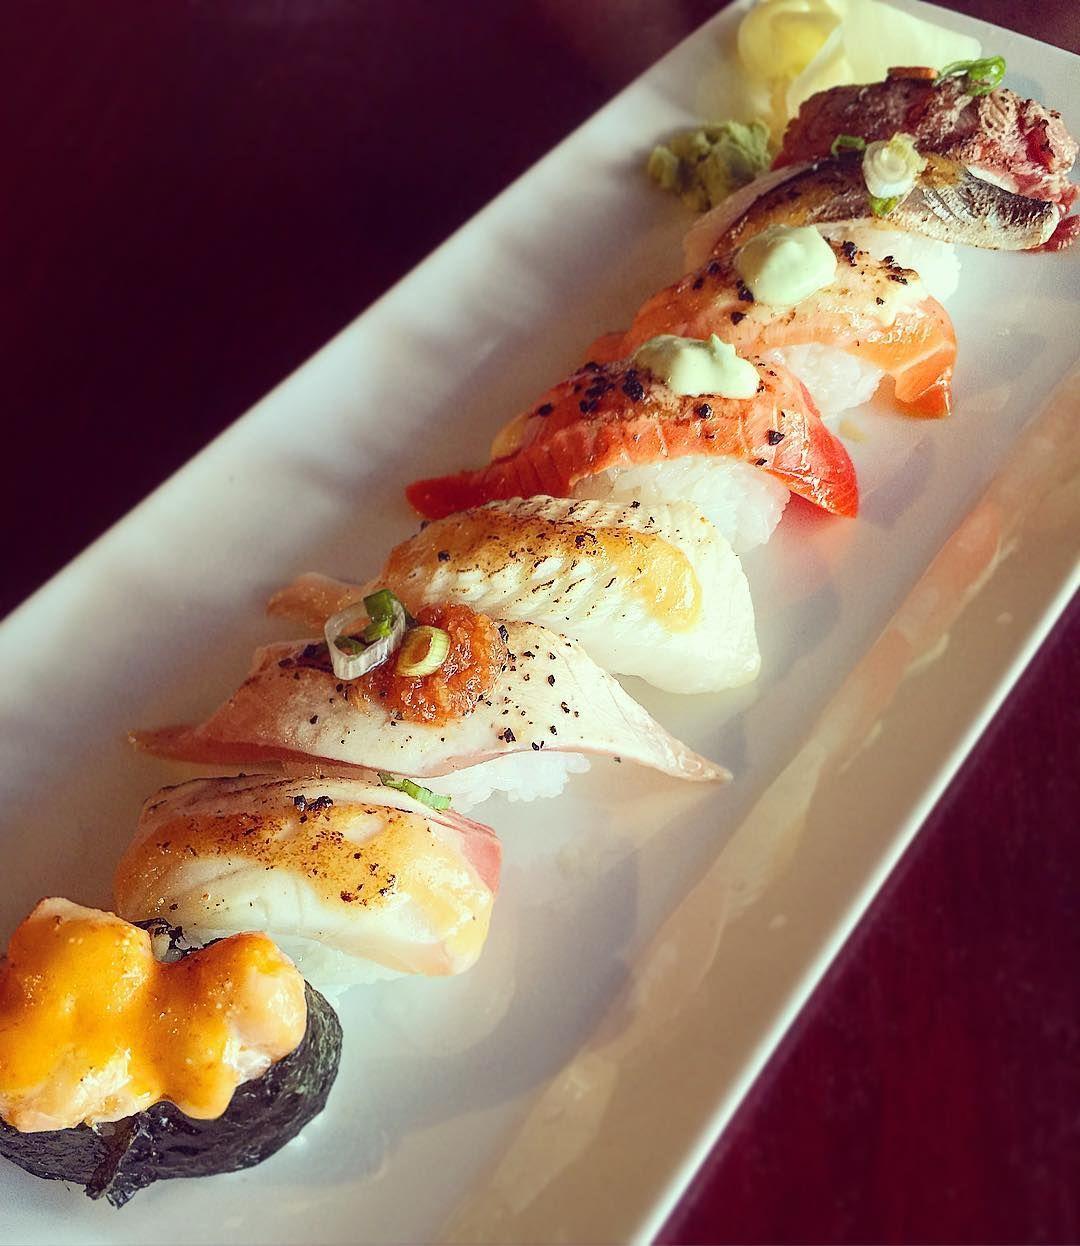 #yvreats #vancitybuzz #vancity #vancouverfoodie #foodieoverselfie #foodie #japanesefood #oishi #delicious #yummy #mouthwatering #foodporn #nigiri #aburi #collection #sushi #sushiloku #sushiforbreakfast #breakfast #lategram #fresh Such great tasting aburi a collection of Tuna Salmon Wild Salmon Hamachi Tako Beef Toro Chopped scallop by timewarpremy